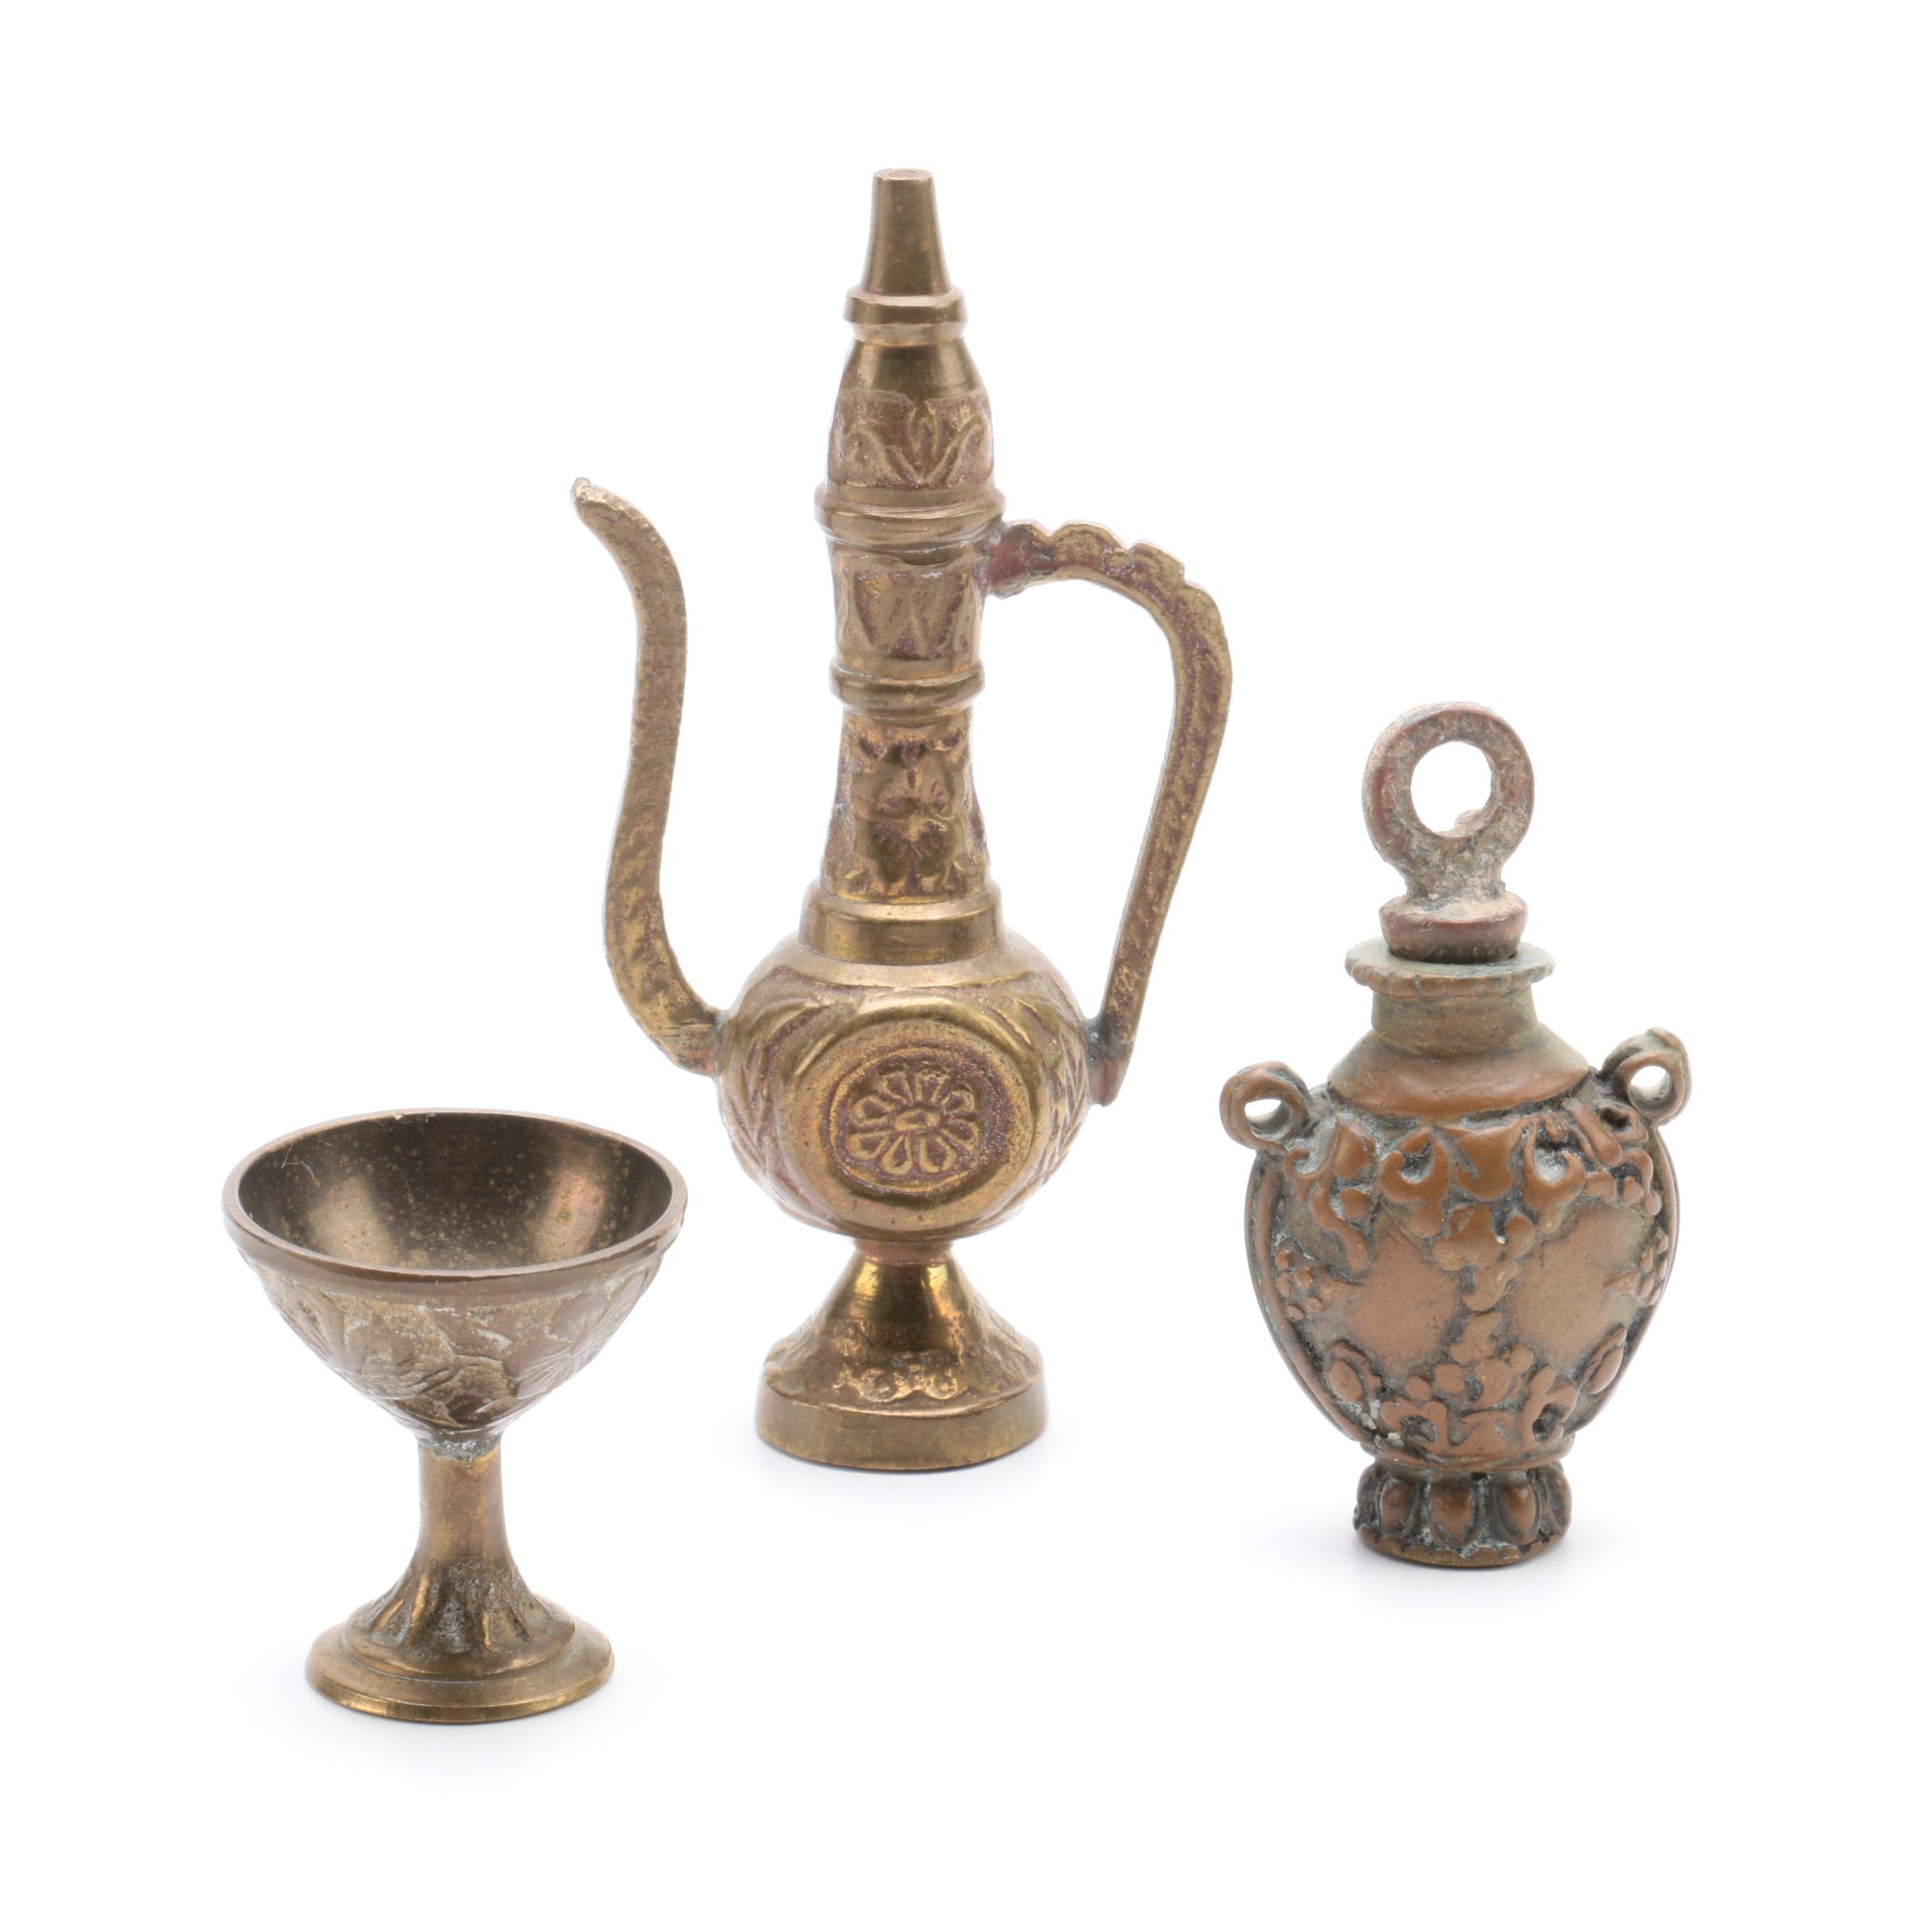 Metal Teapot Figurine, Goblet, and Bottle